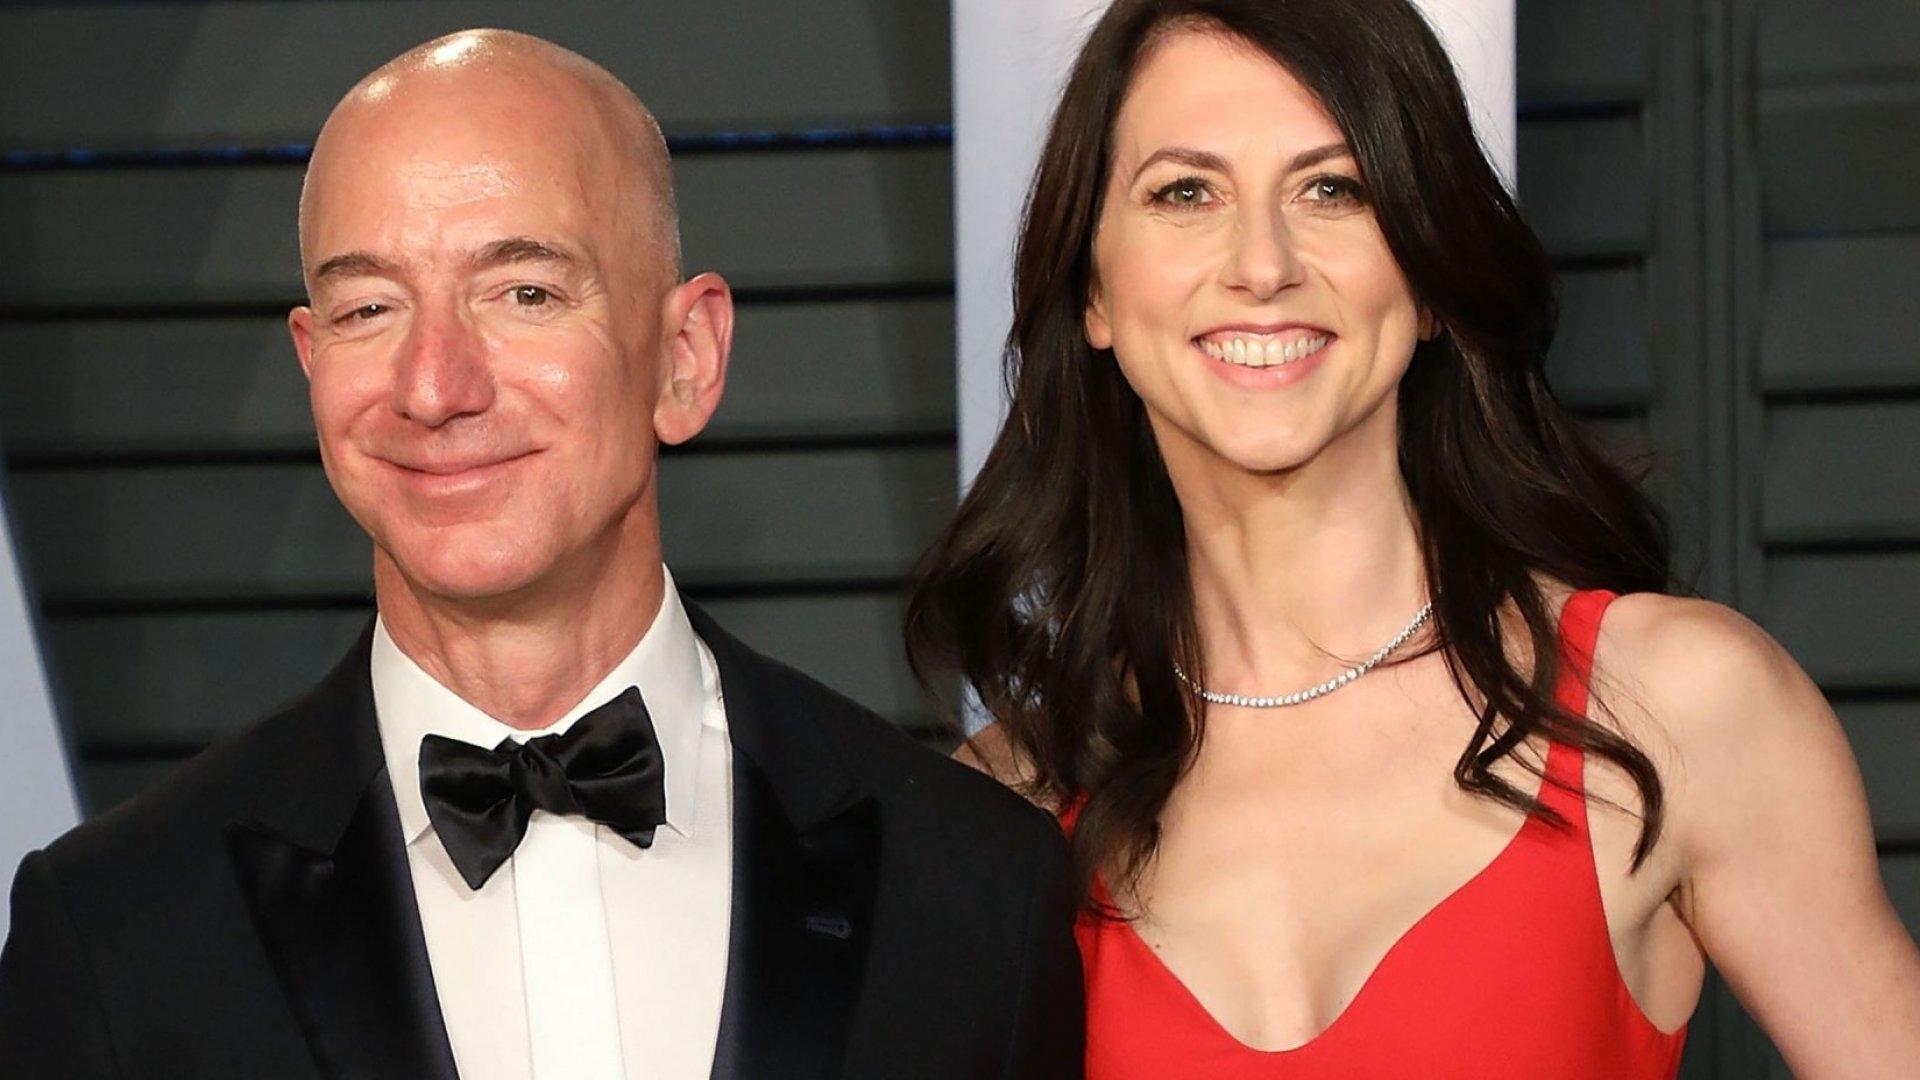 MacKenzie and Jeff Bezos.